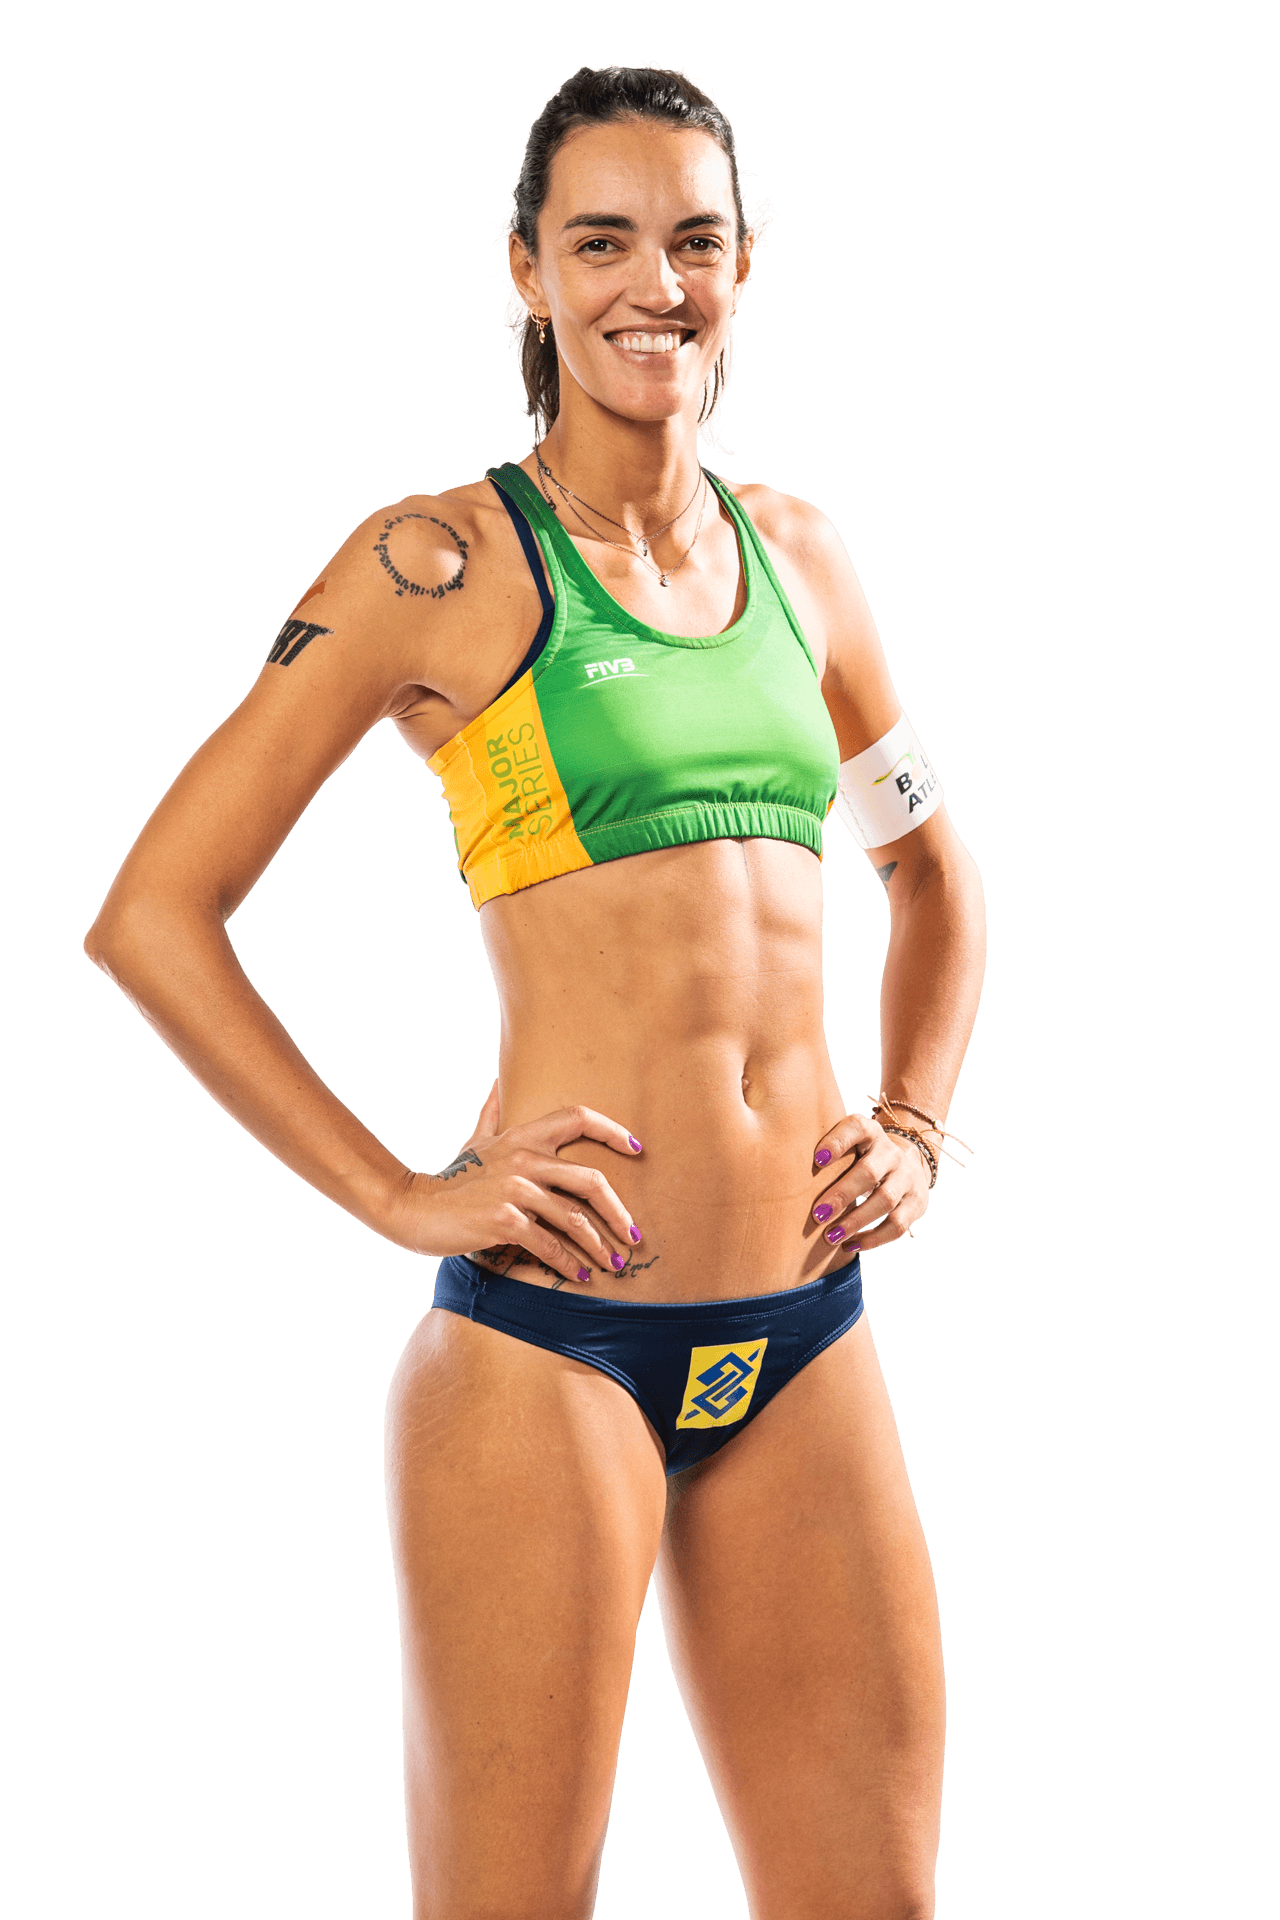 Bikini Mariana de Souza Alves Lima nude photos 2019